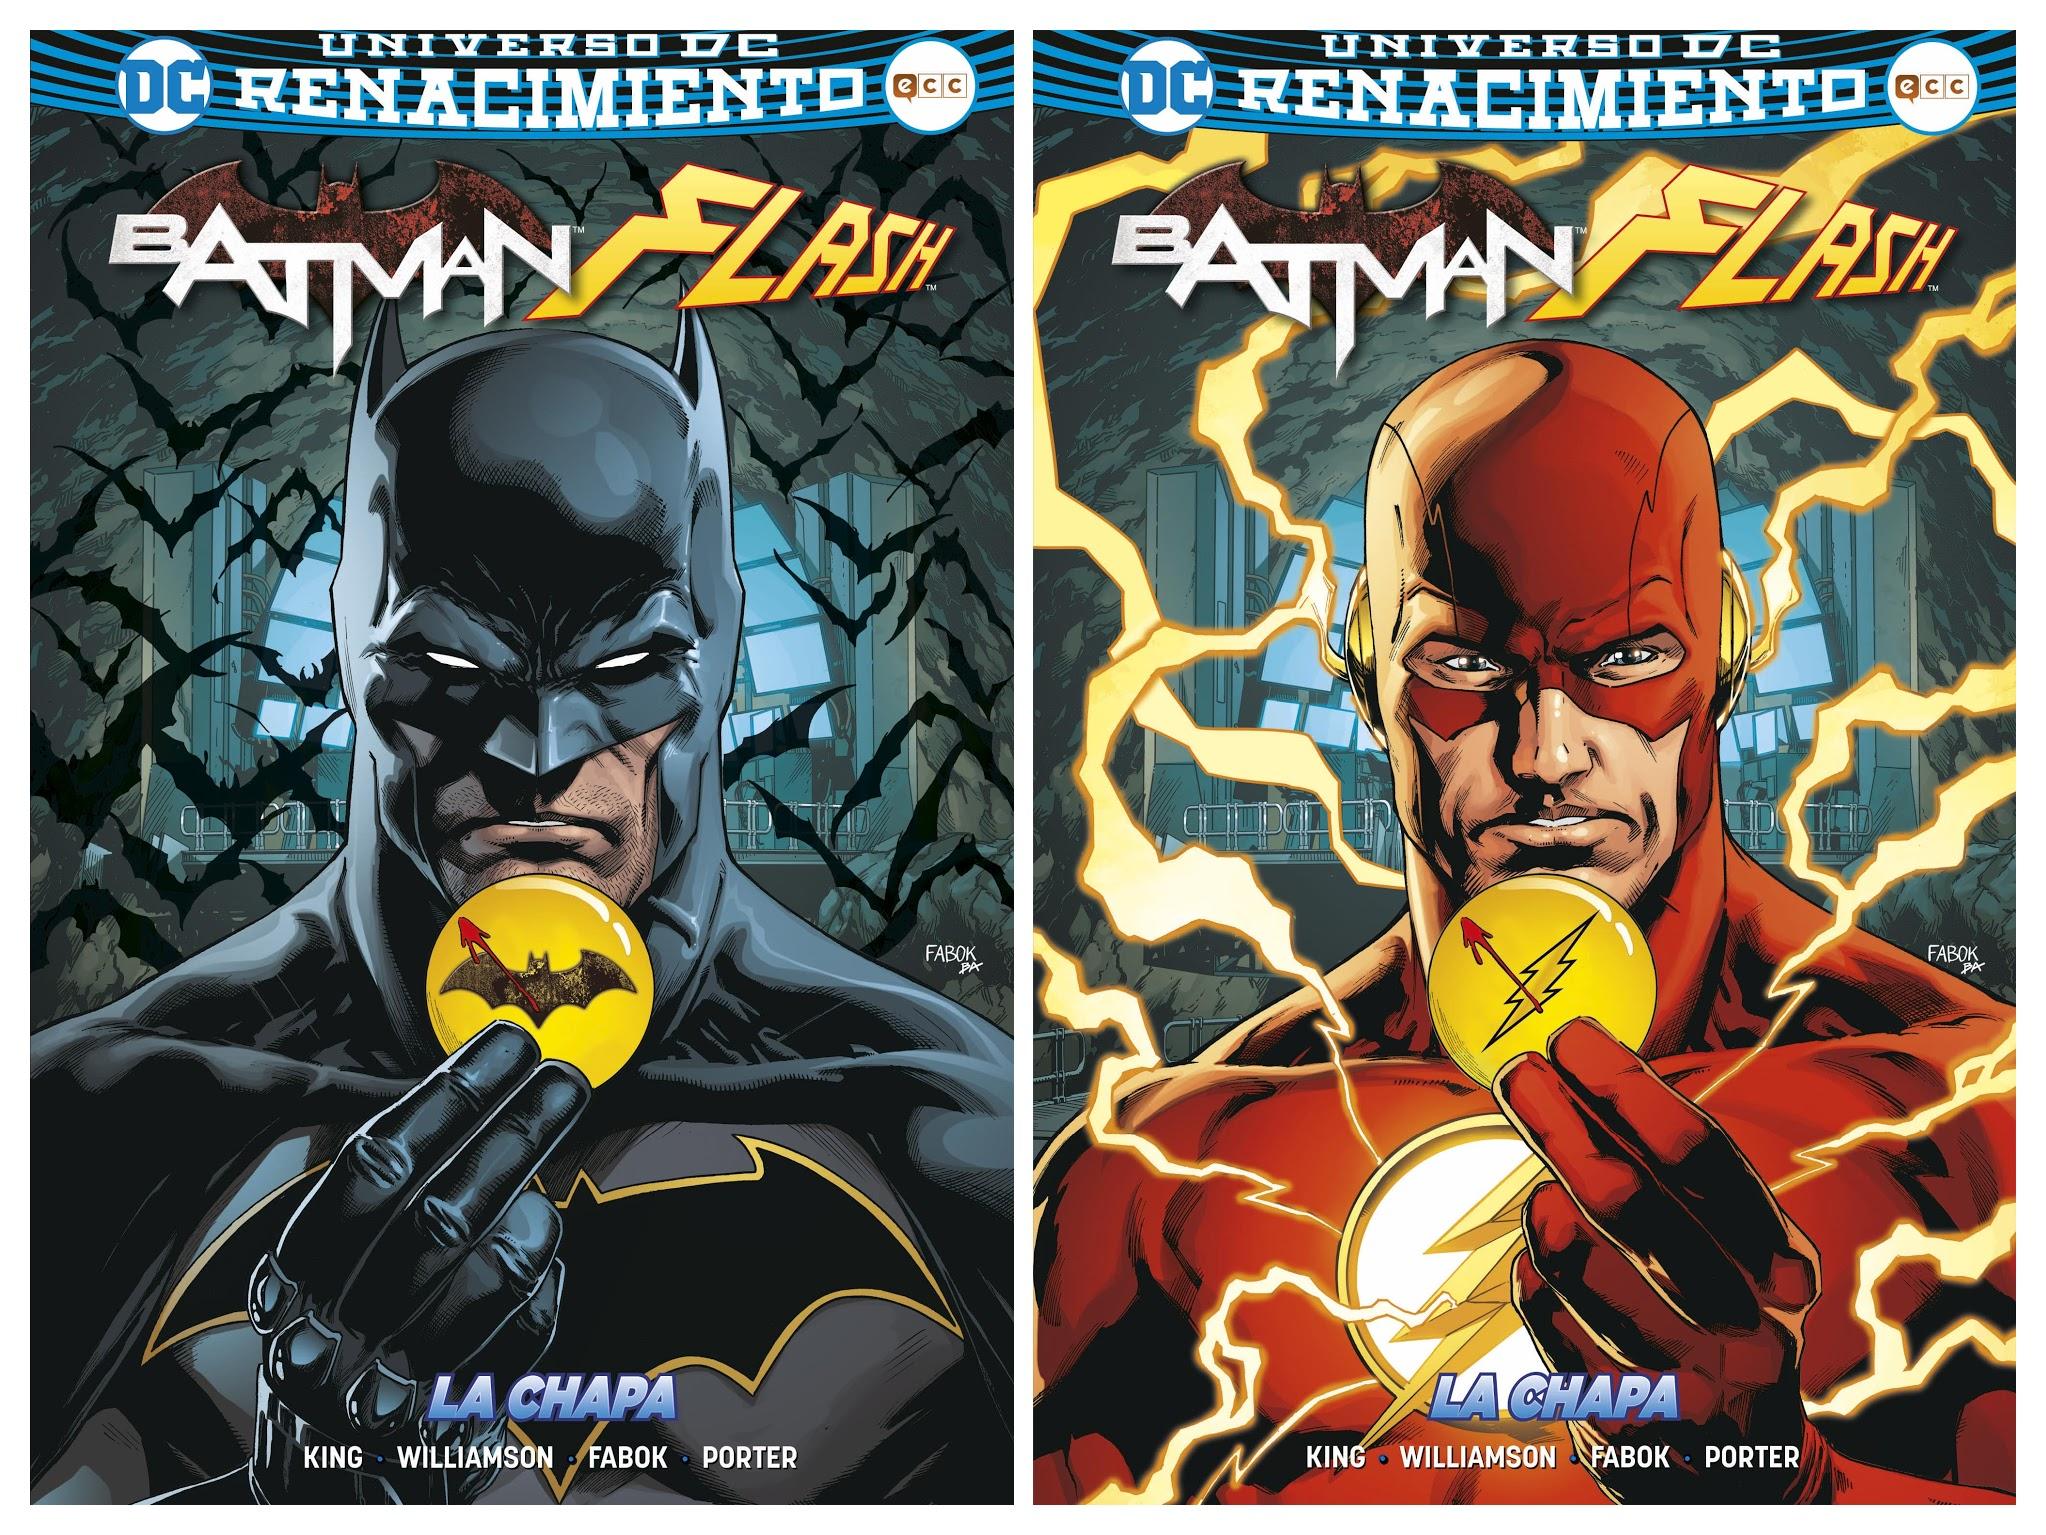 [PANINI] Lançamentos e novidades - Página 14 Cubierta_batman_flash_la_chapa_BATMAN_WEB-COLLAGE